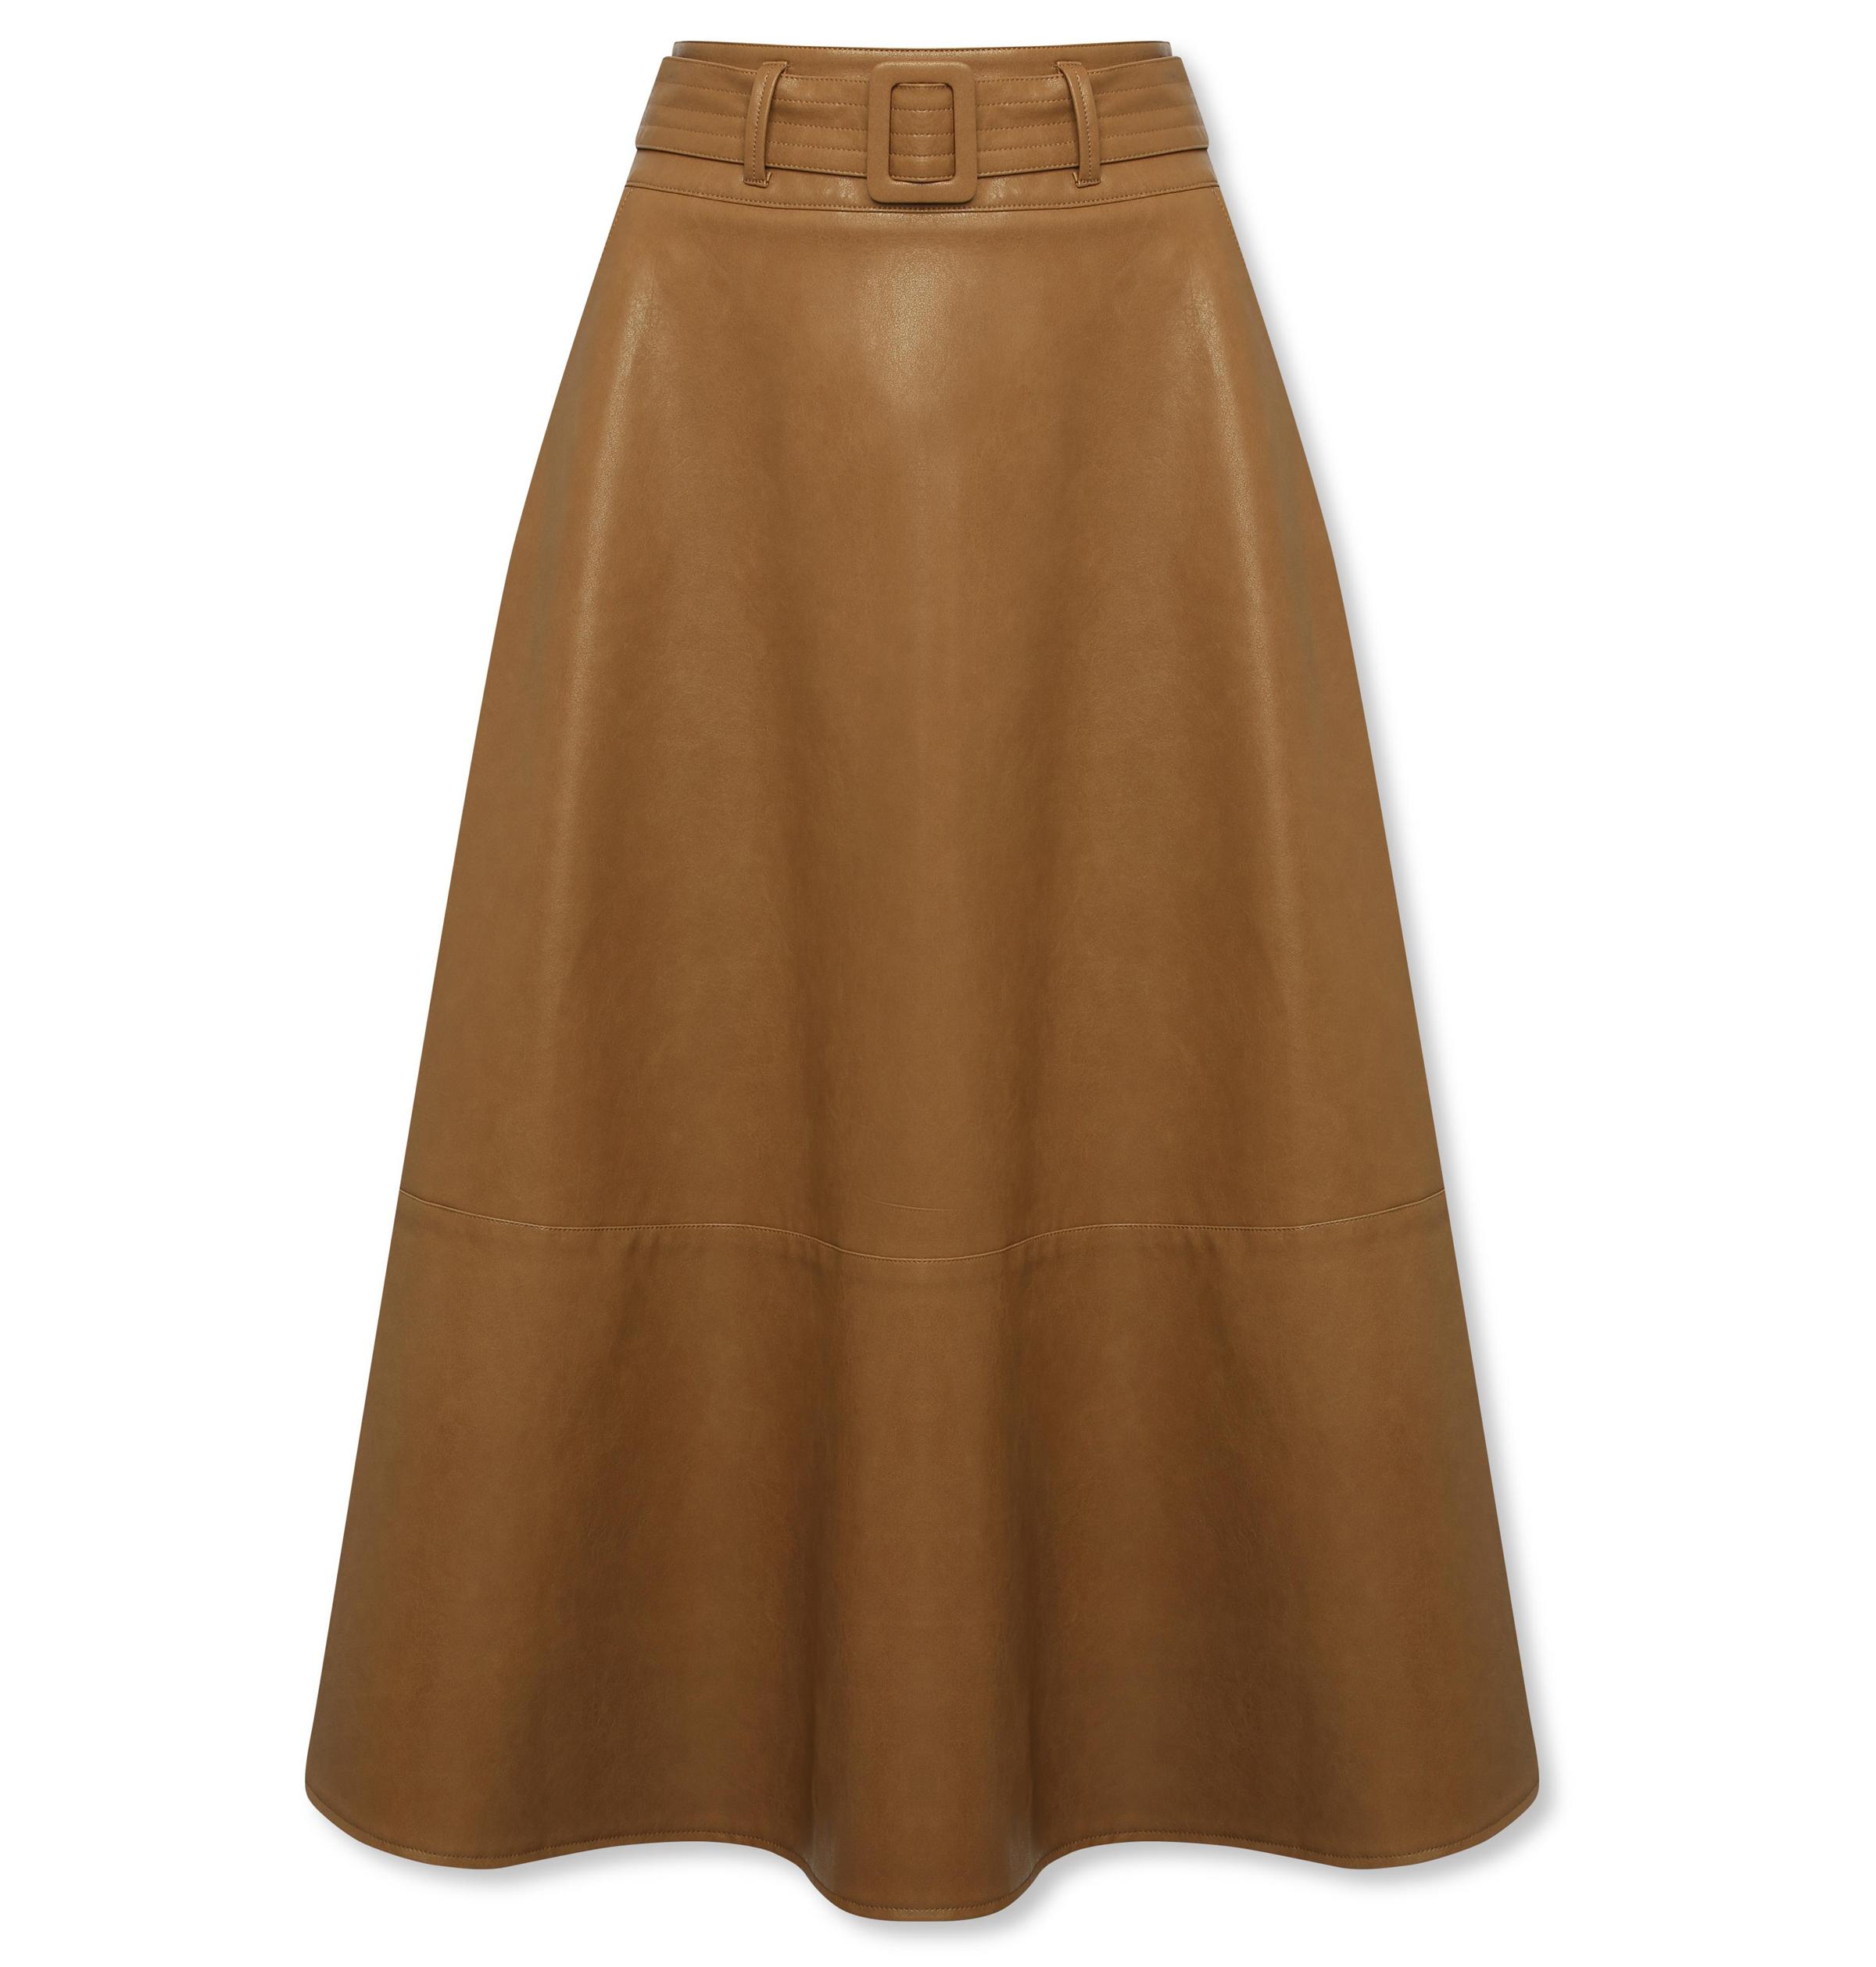 Sonder Studio Tan PU Midi Skirt